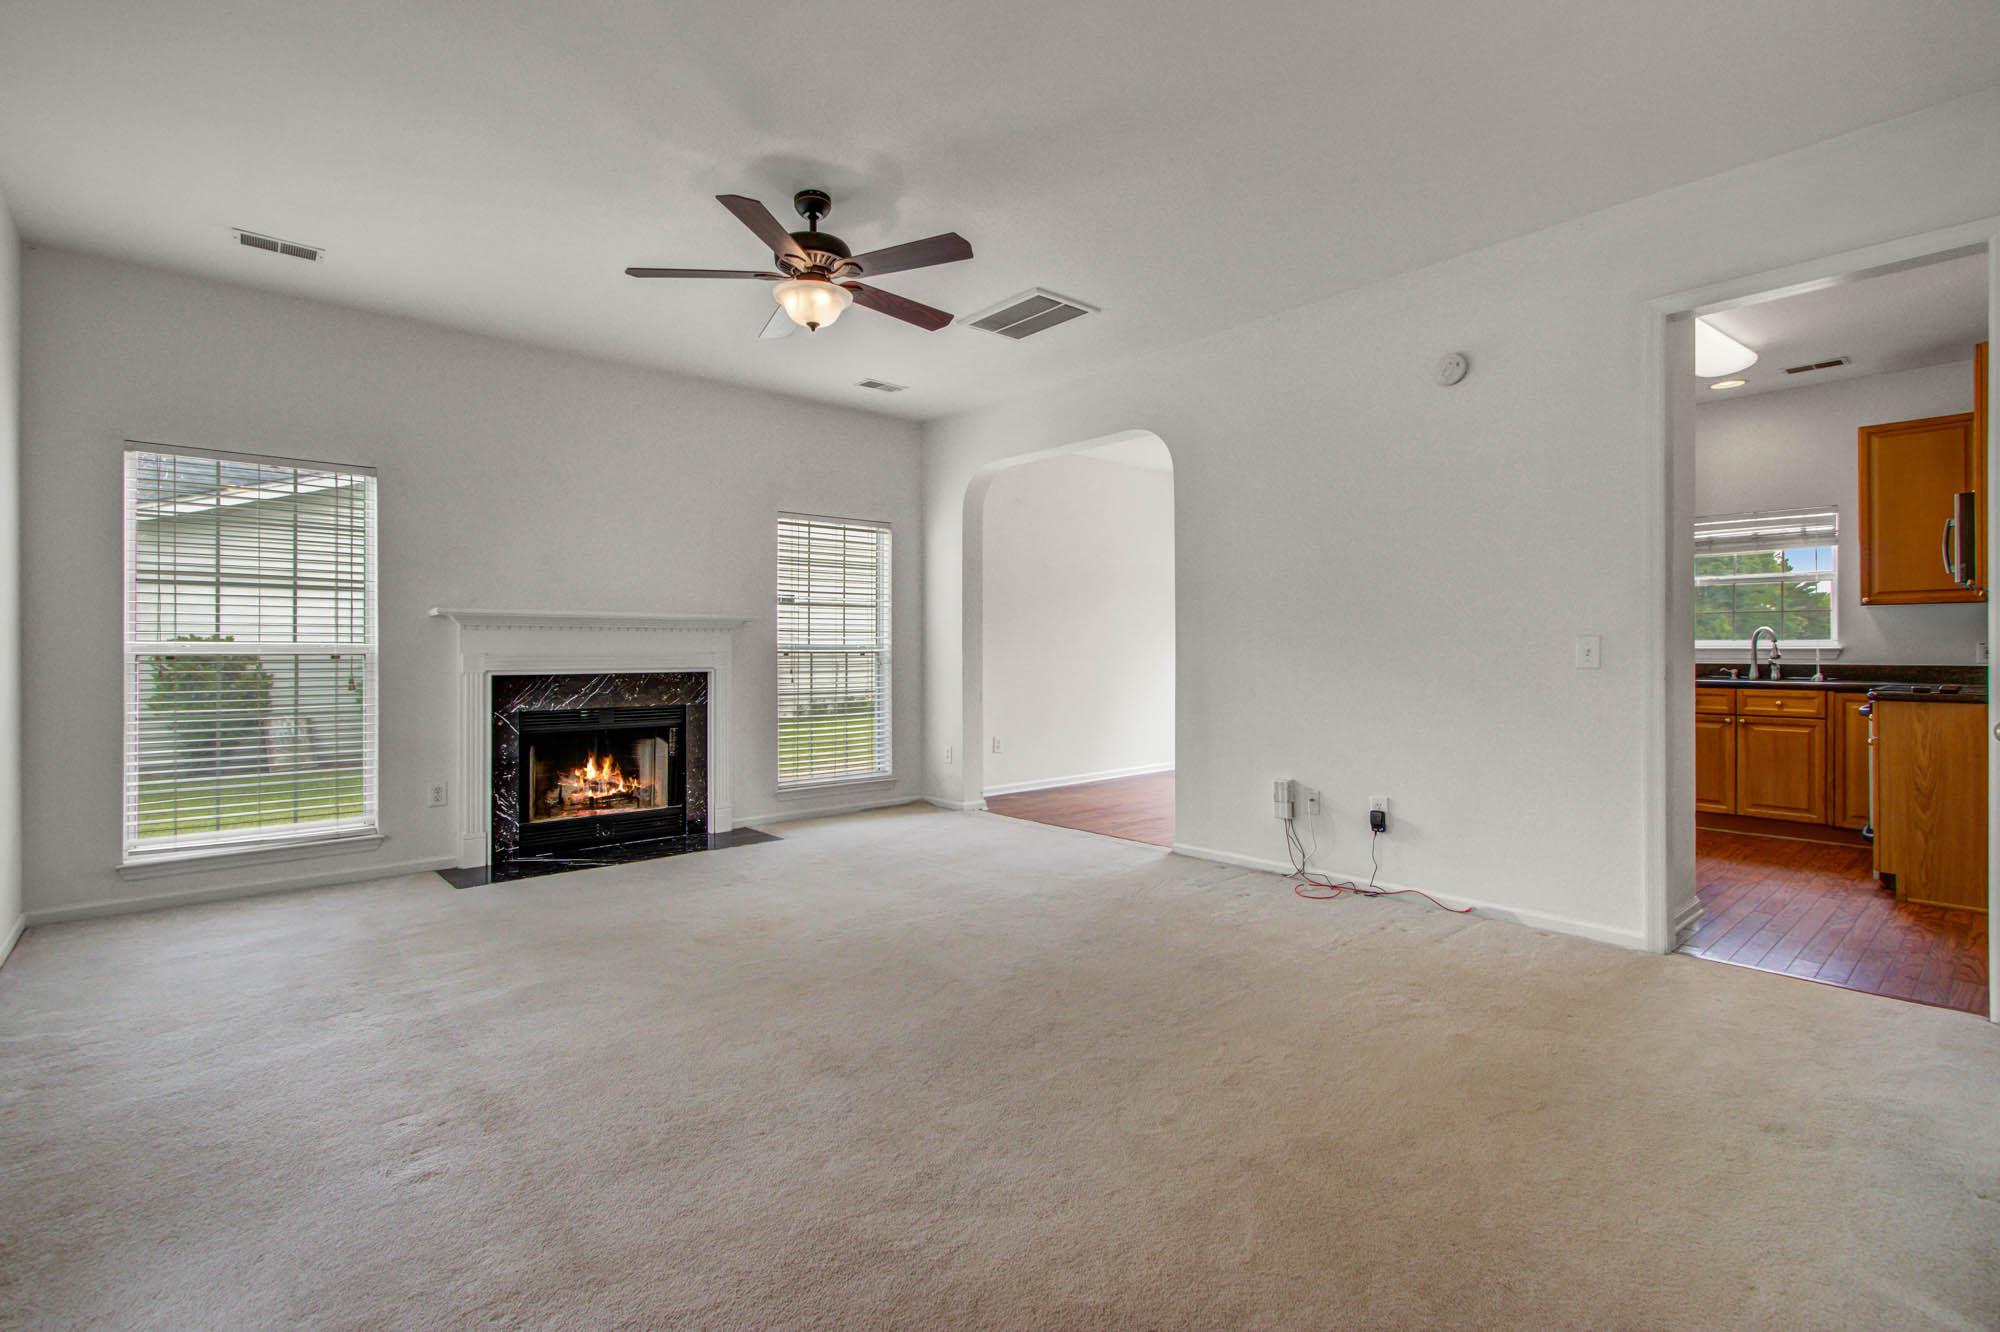 844 Bent Hickory Rd Charleston SC 29414-9076 - Photo 4